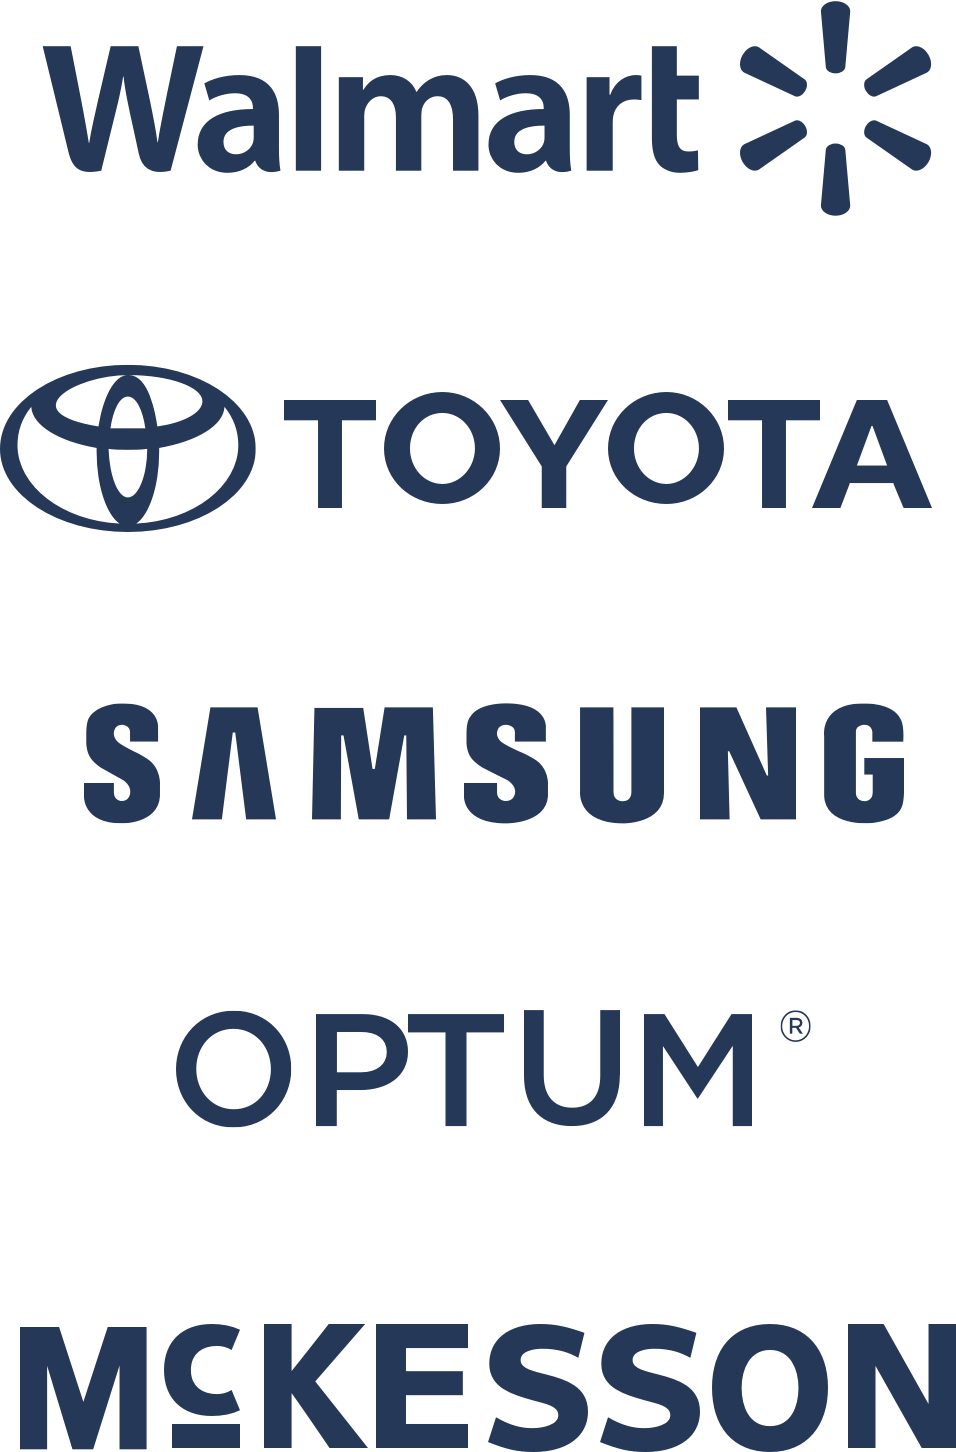 Walmart、Toyota、Samsung、Optum、McKesson 的徽标